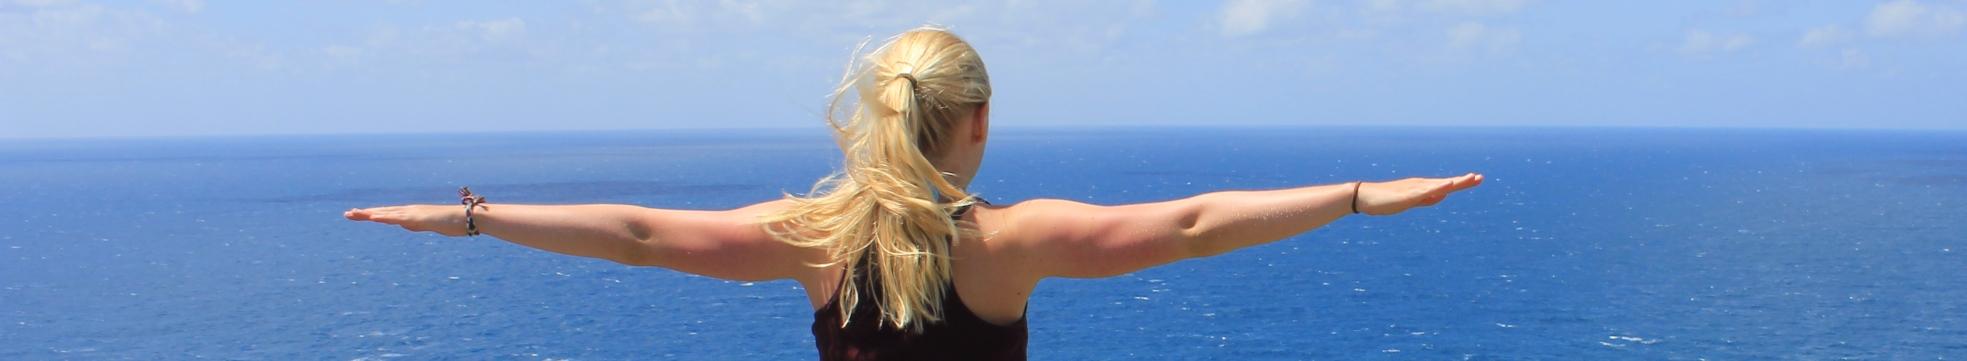 Australien Mädchen Rücken Aussicht